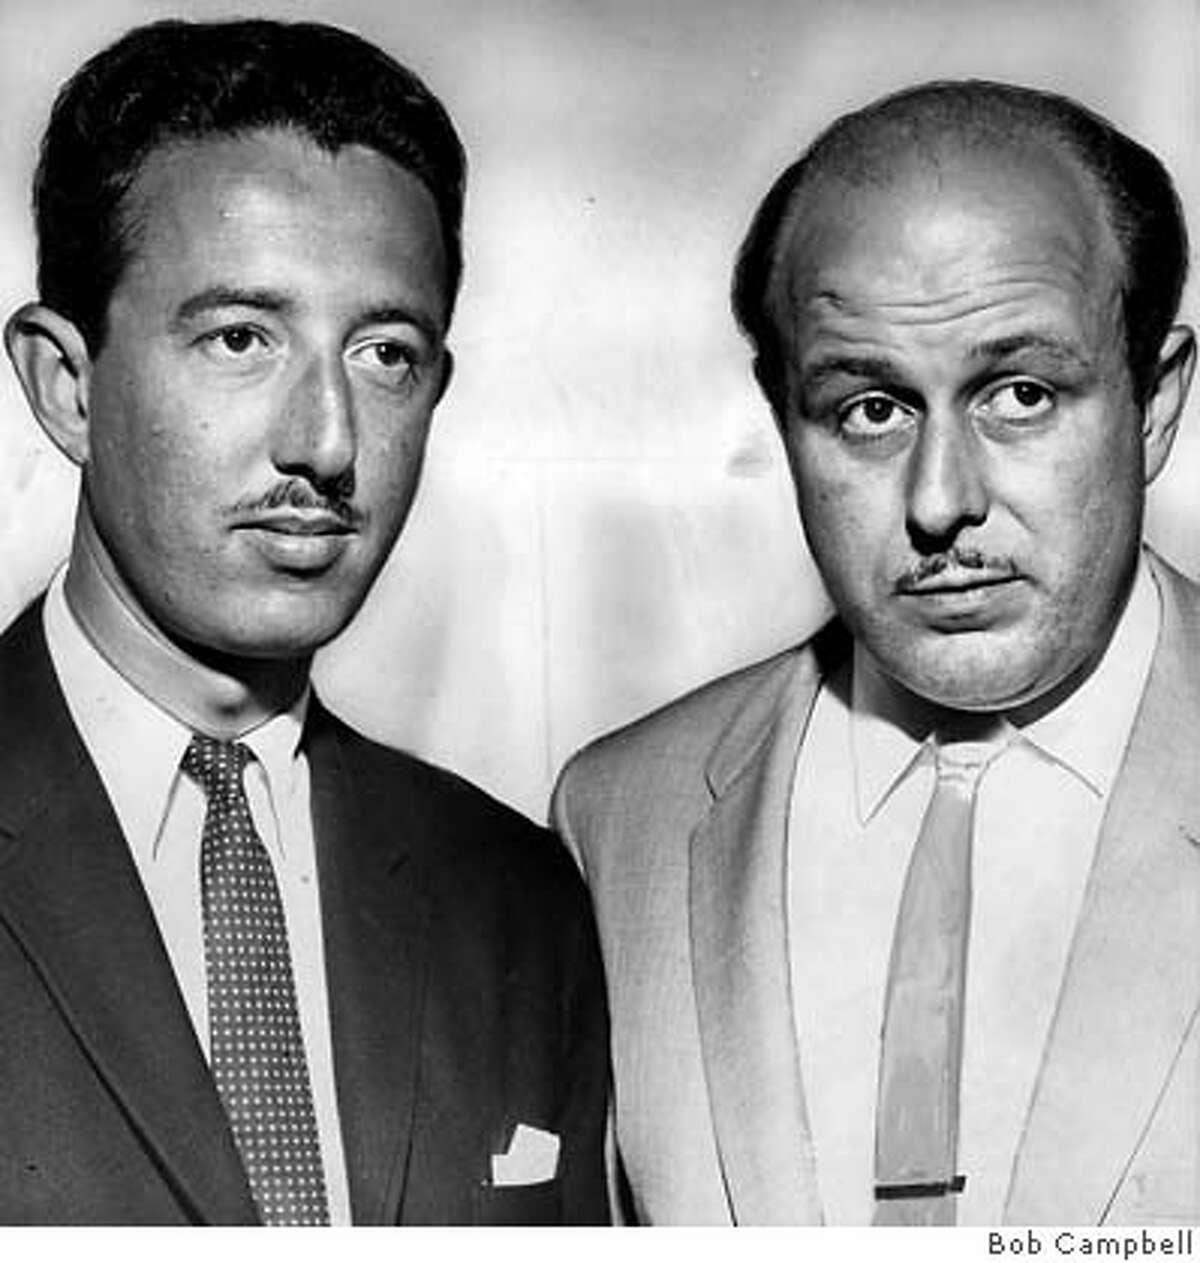 WERBER-30JUN1958-CAMPBELL - Frank Weber and Enrico Banducci. photo by Bob Campbell